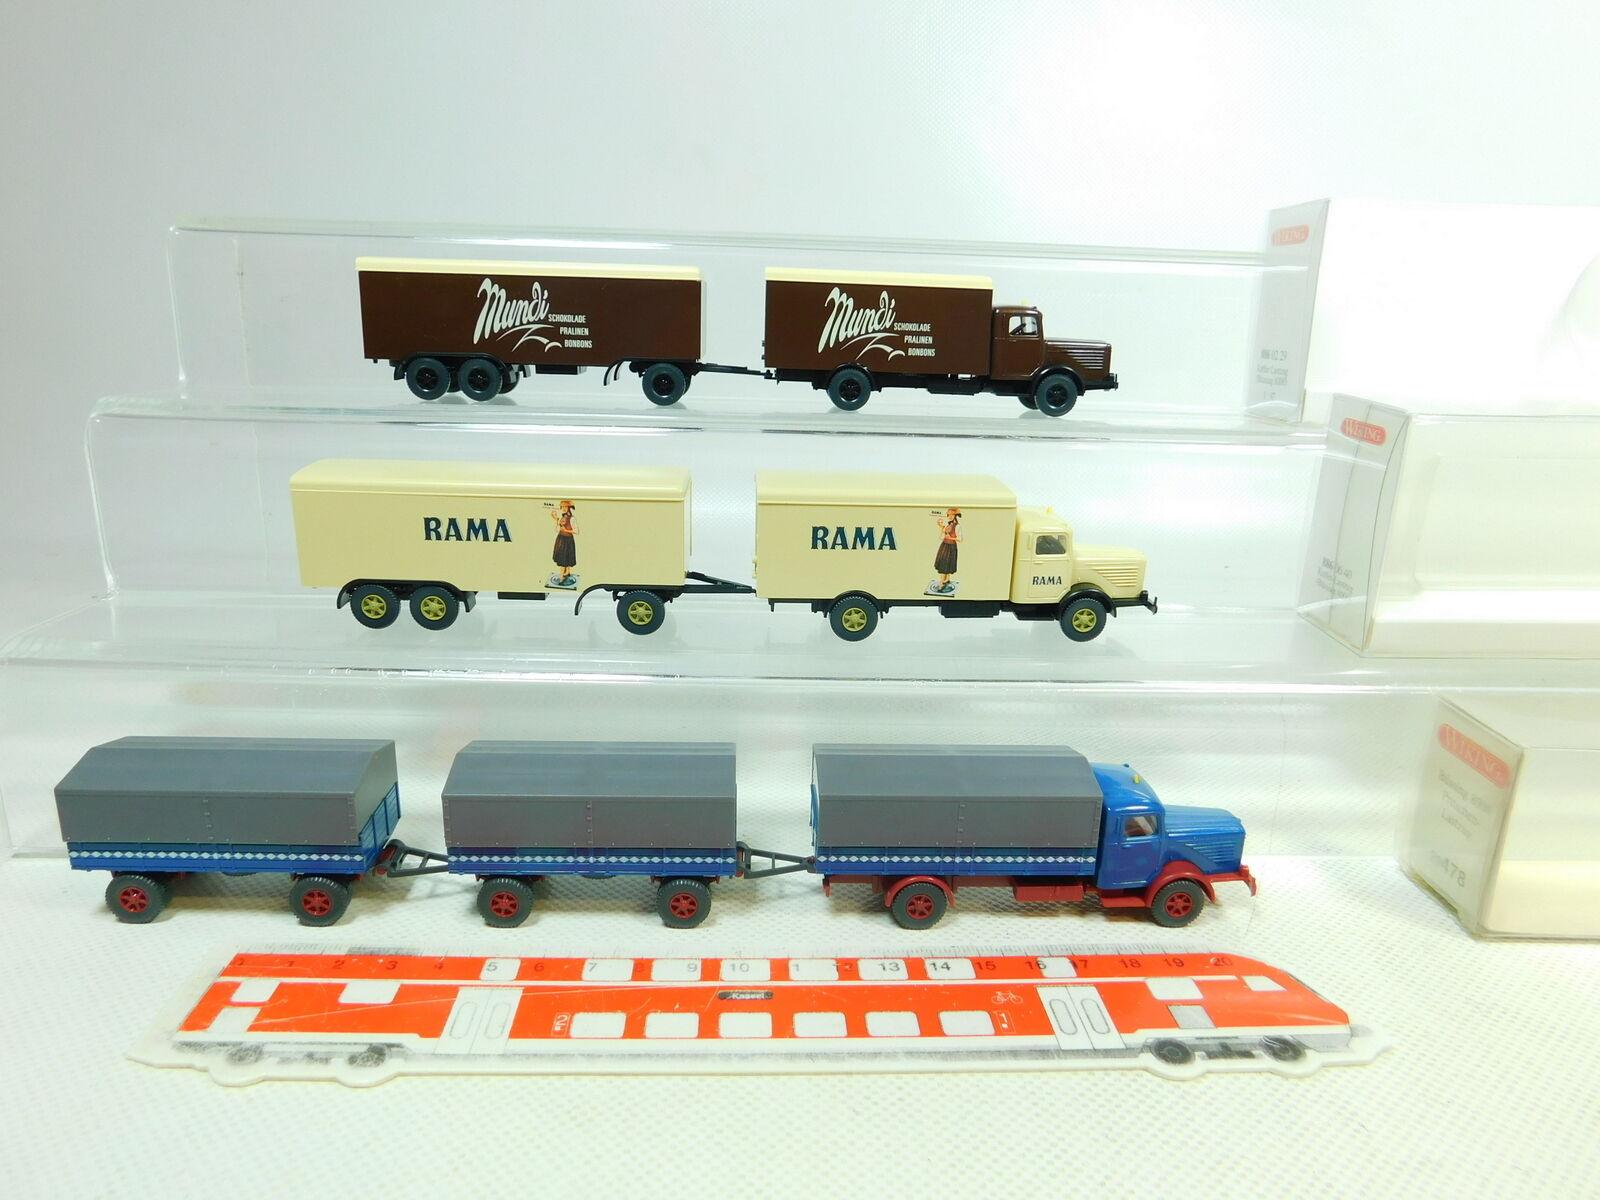 Bt326-0, 5  3x WIKING h0 1 87 Camion Büssing  886 Rama mundi  478, très bien  neuf dans sa boîte